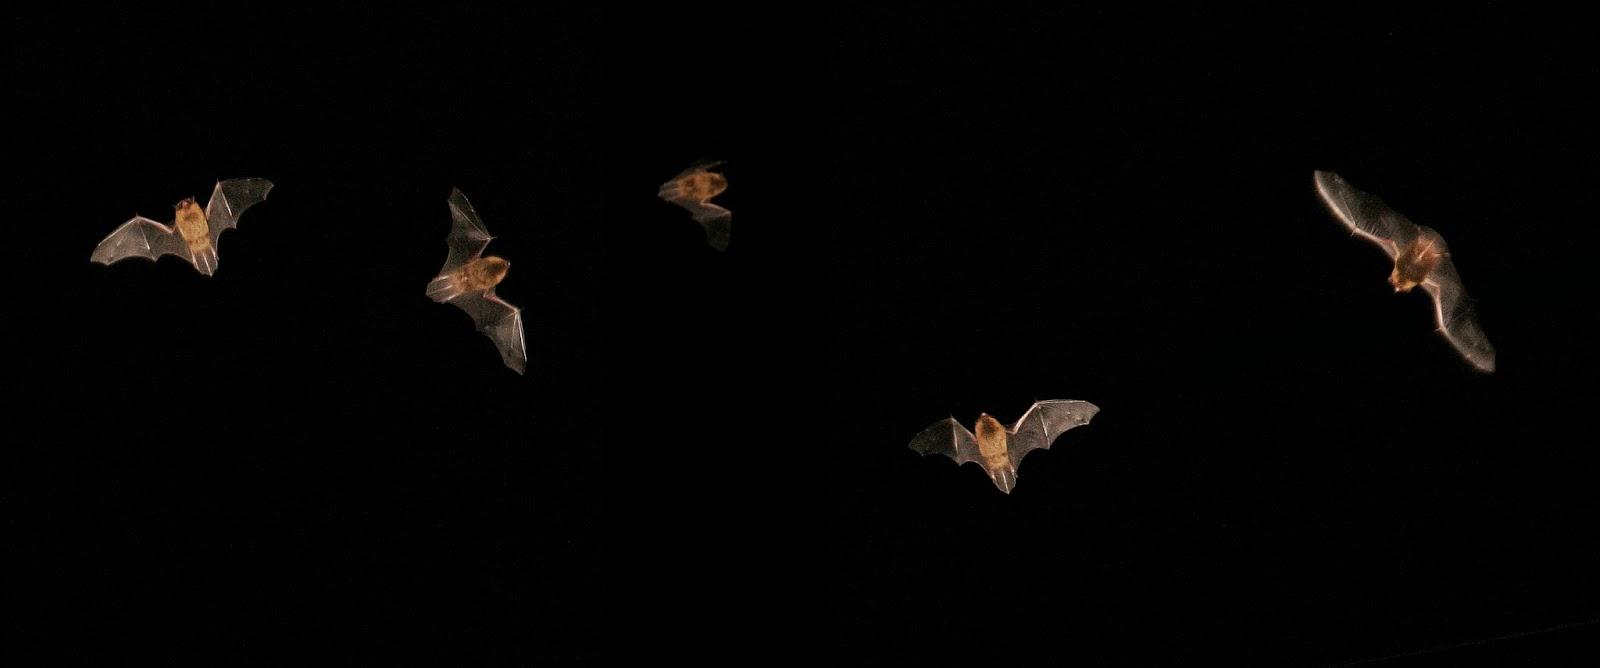 Bats in flight (Photo: Stuart Anthony, via Flickr Creative Commons and @SpeciesOfUK